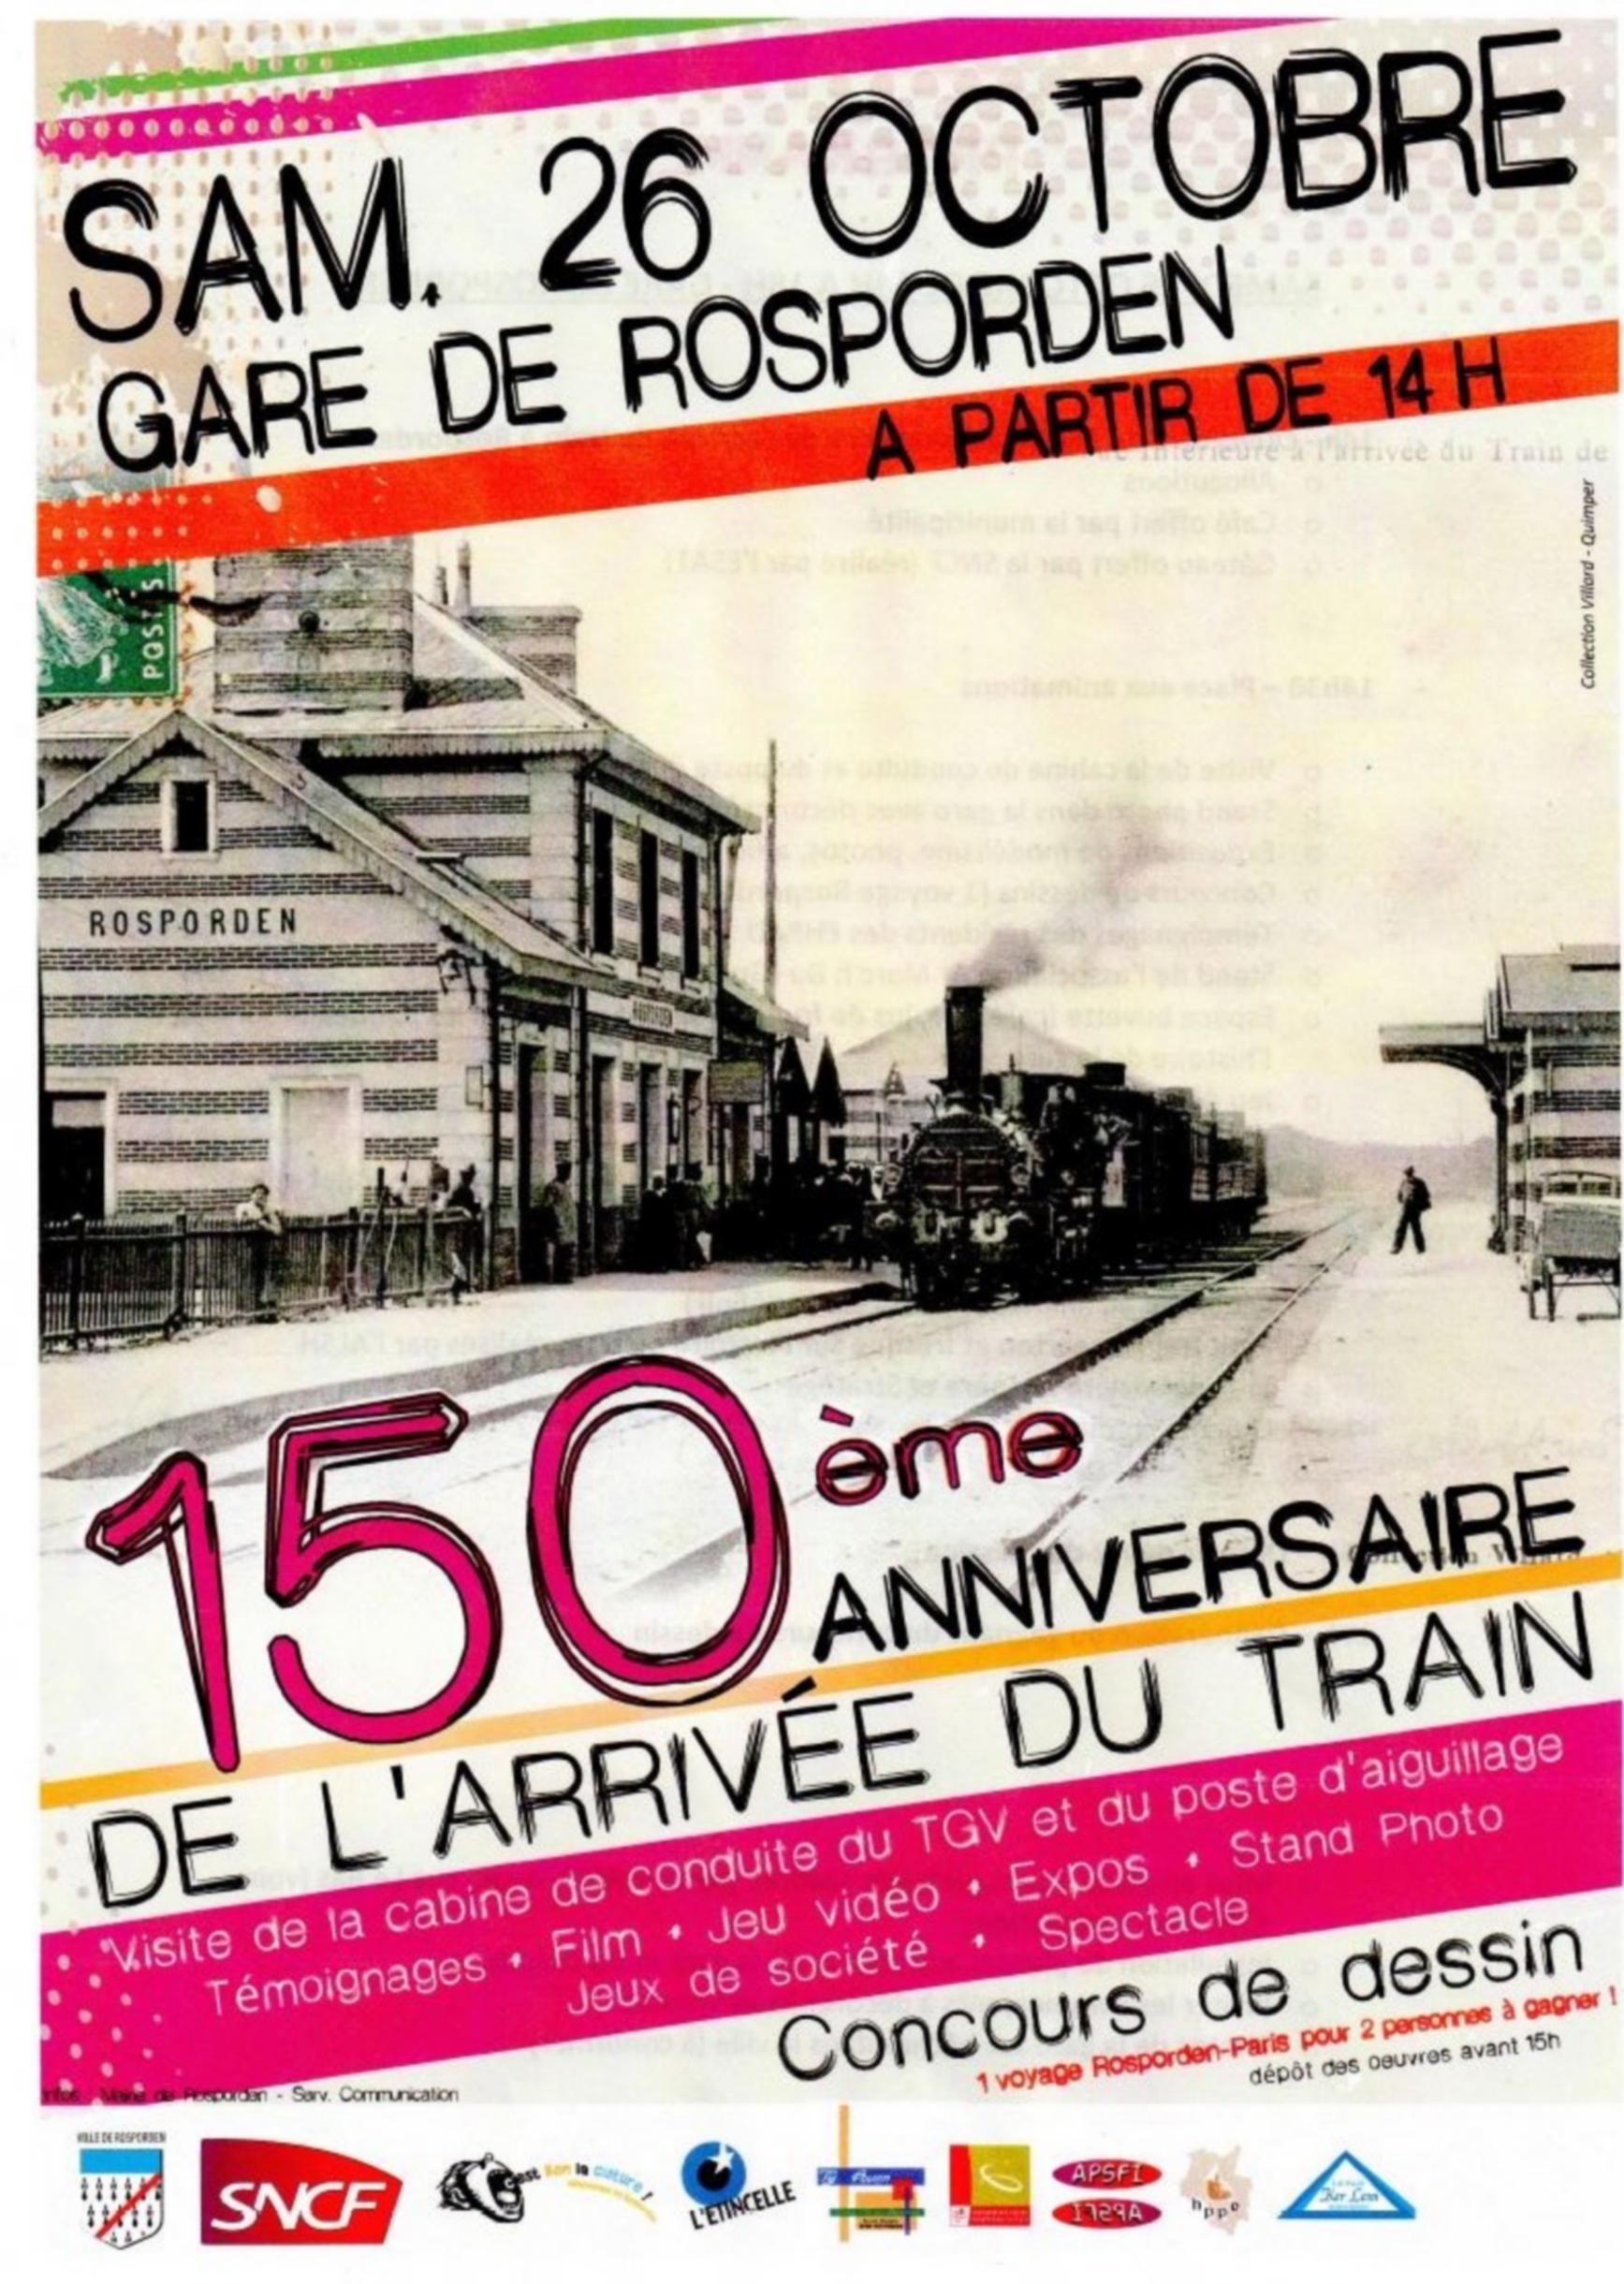 Rosporden 150 ans Arrivée du train